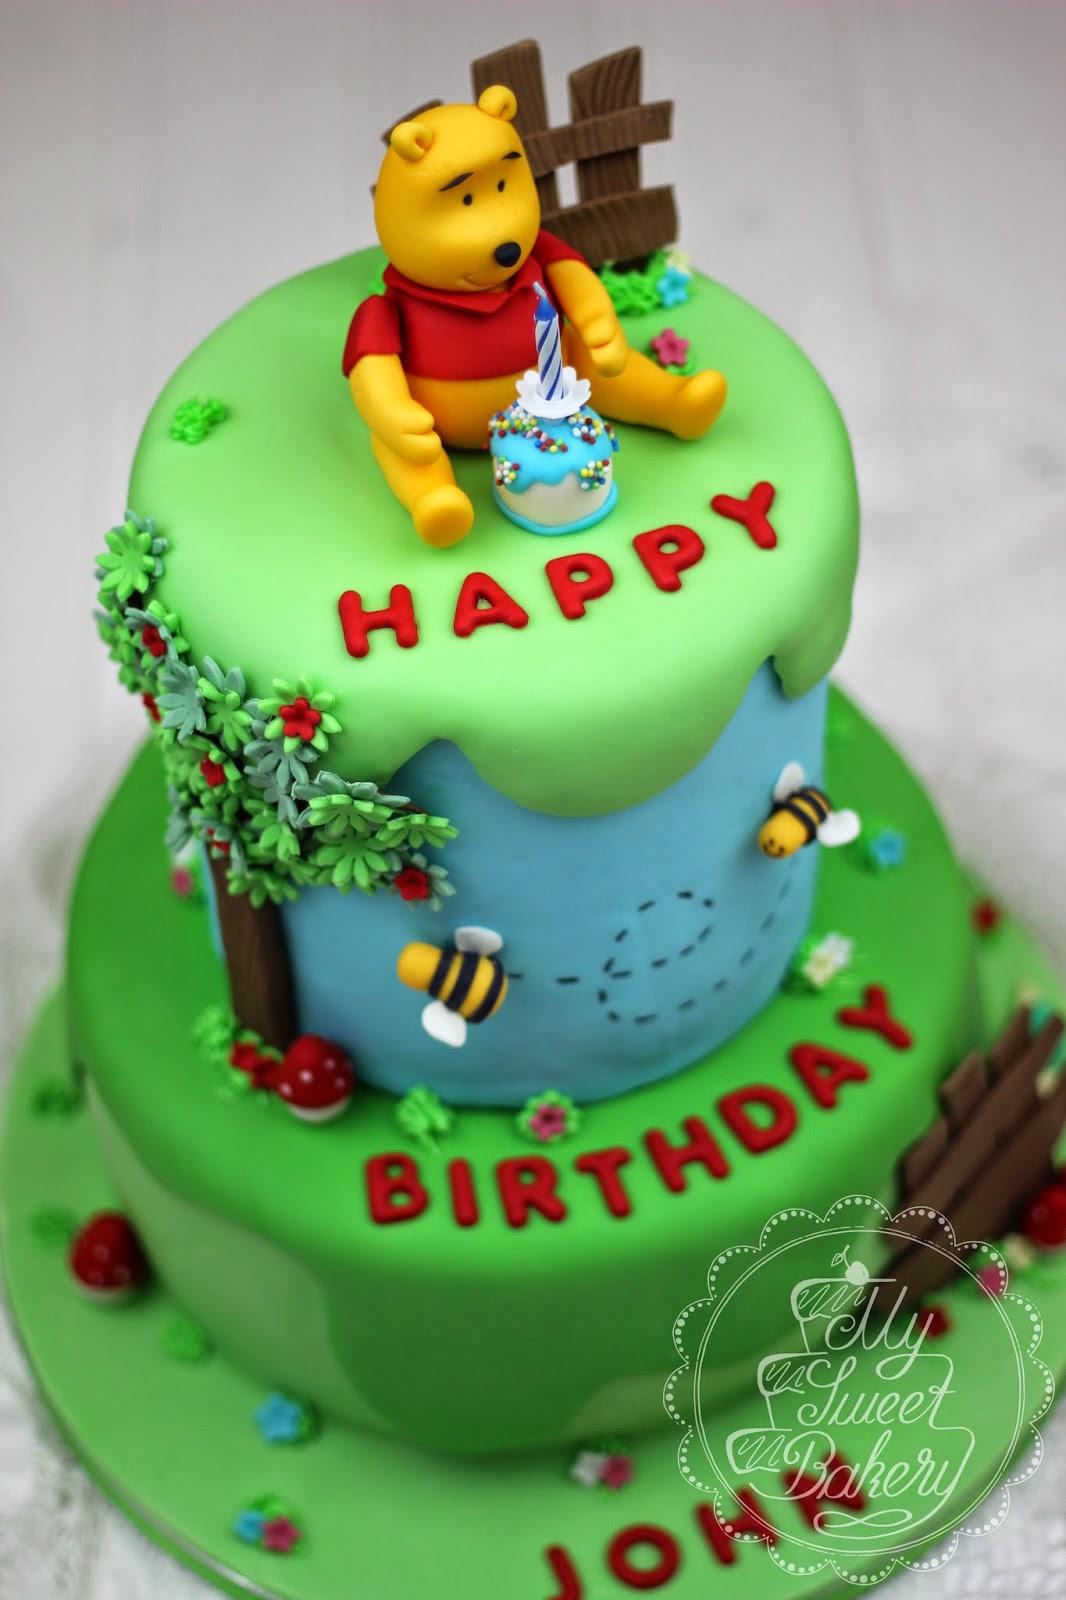 My sweet bakery winnie pooh torte 1st birthday cake for Winnie pooh kuchen deko